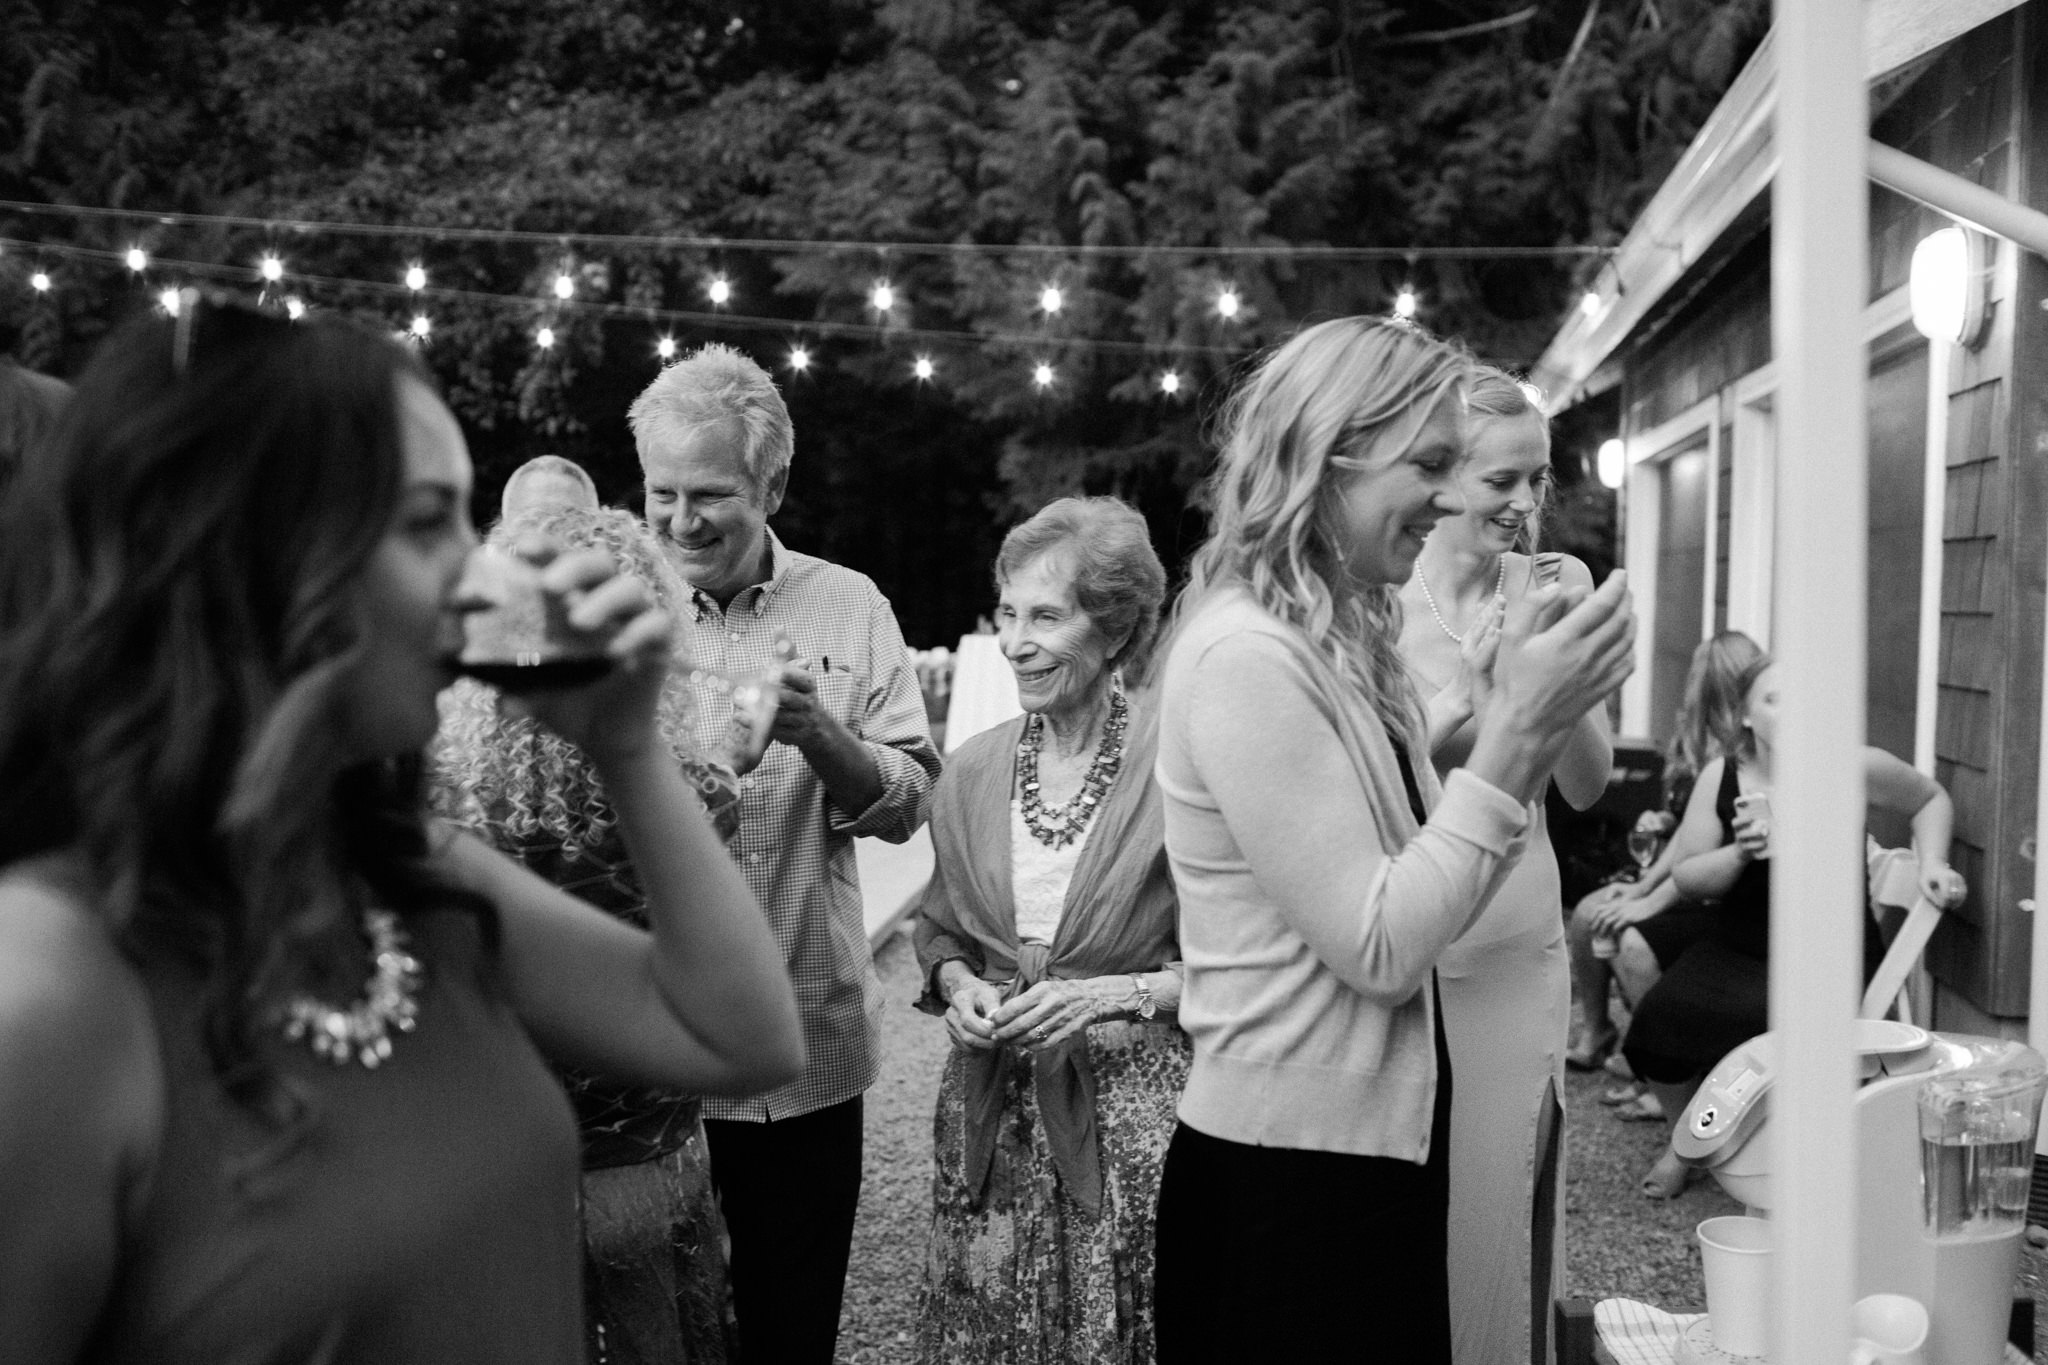 Backyard-Bainbridge-Island-Wedding-Alycia-Lovell-Photography-248.JPG